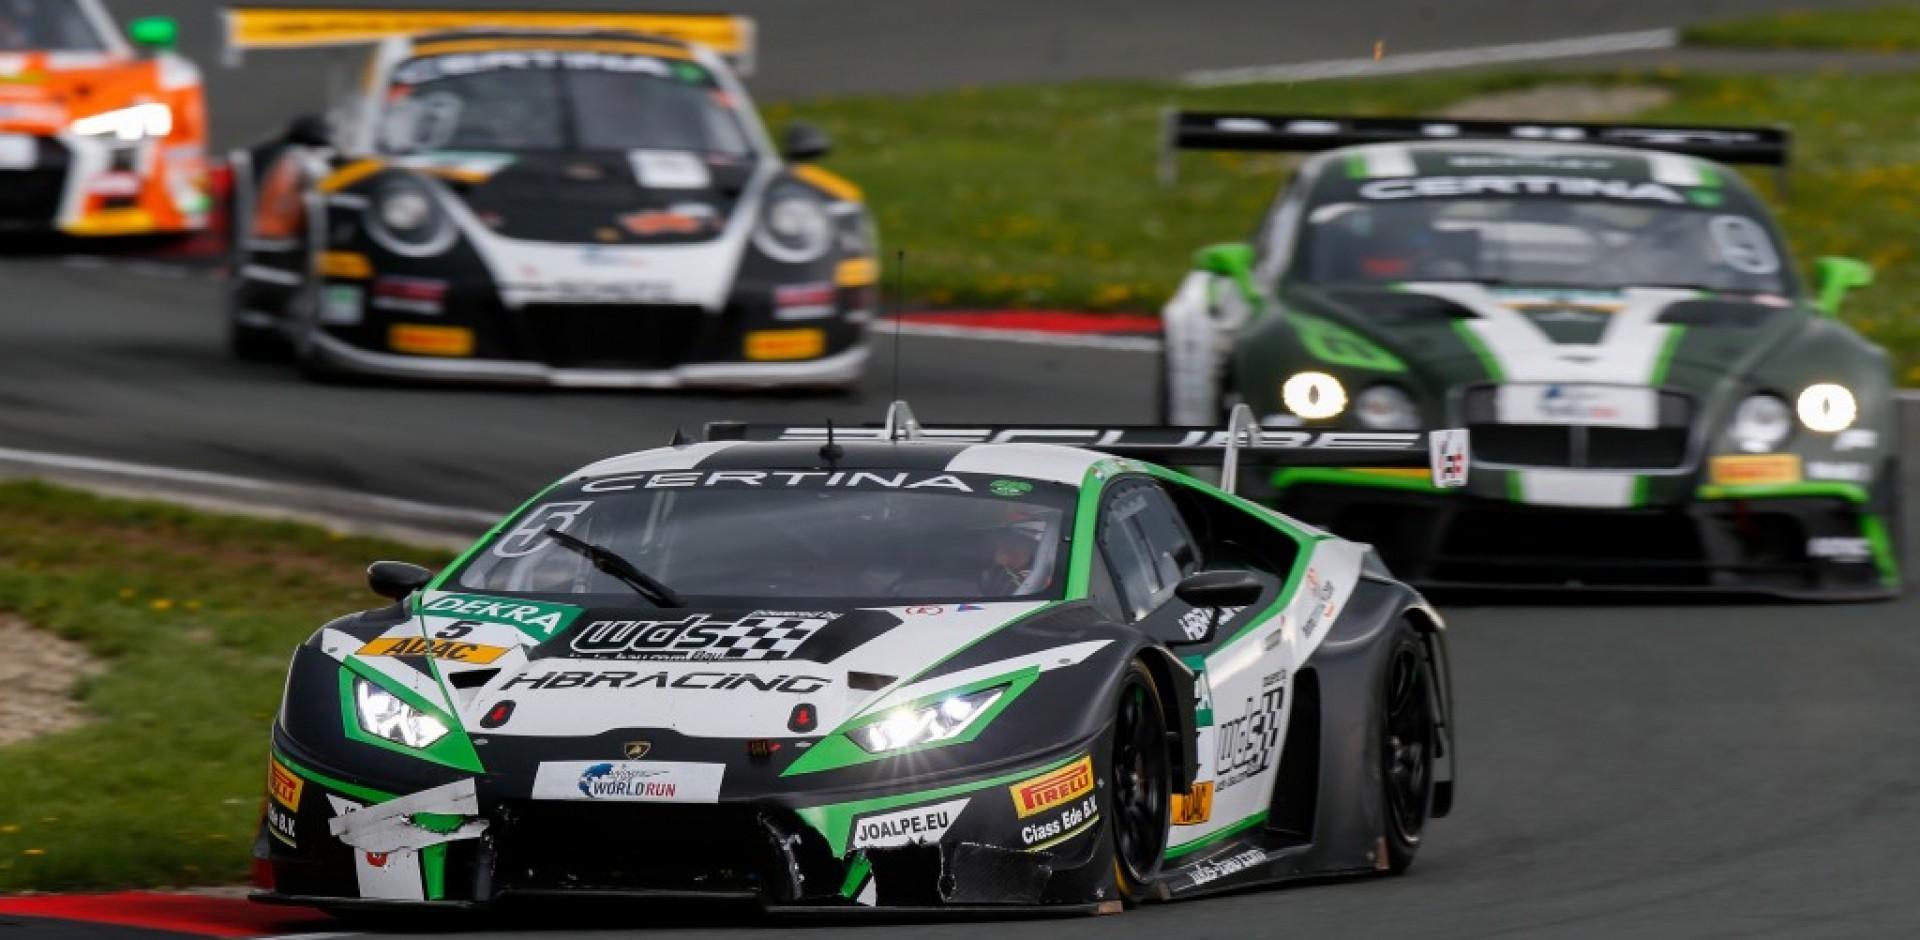 Norbert Siedler bei Lamborghini-Premiere nur knapp an den Punkten vorbei